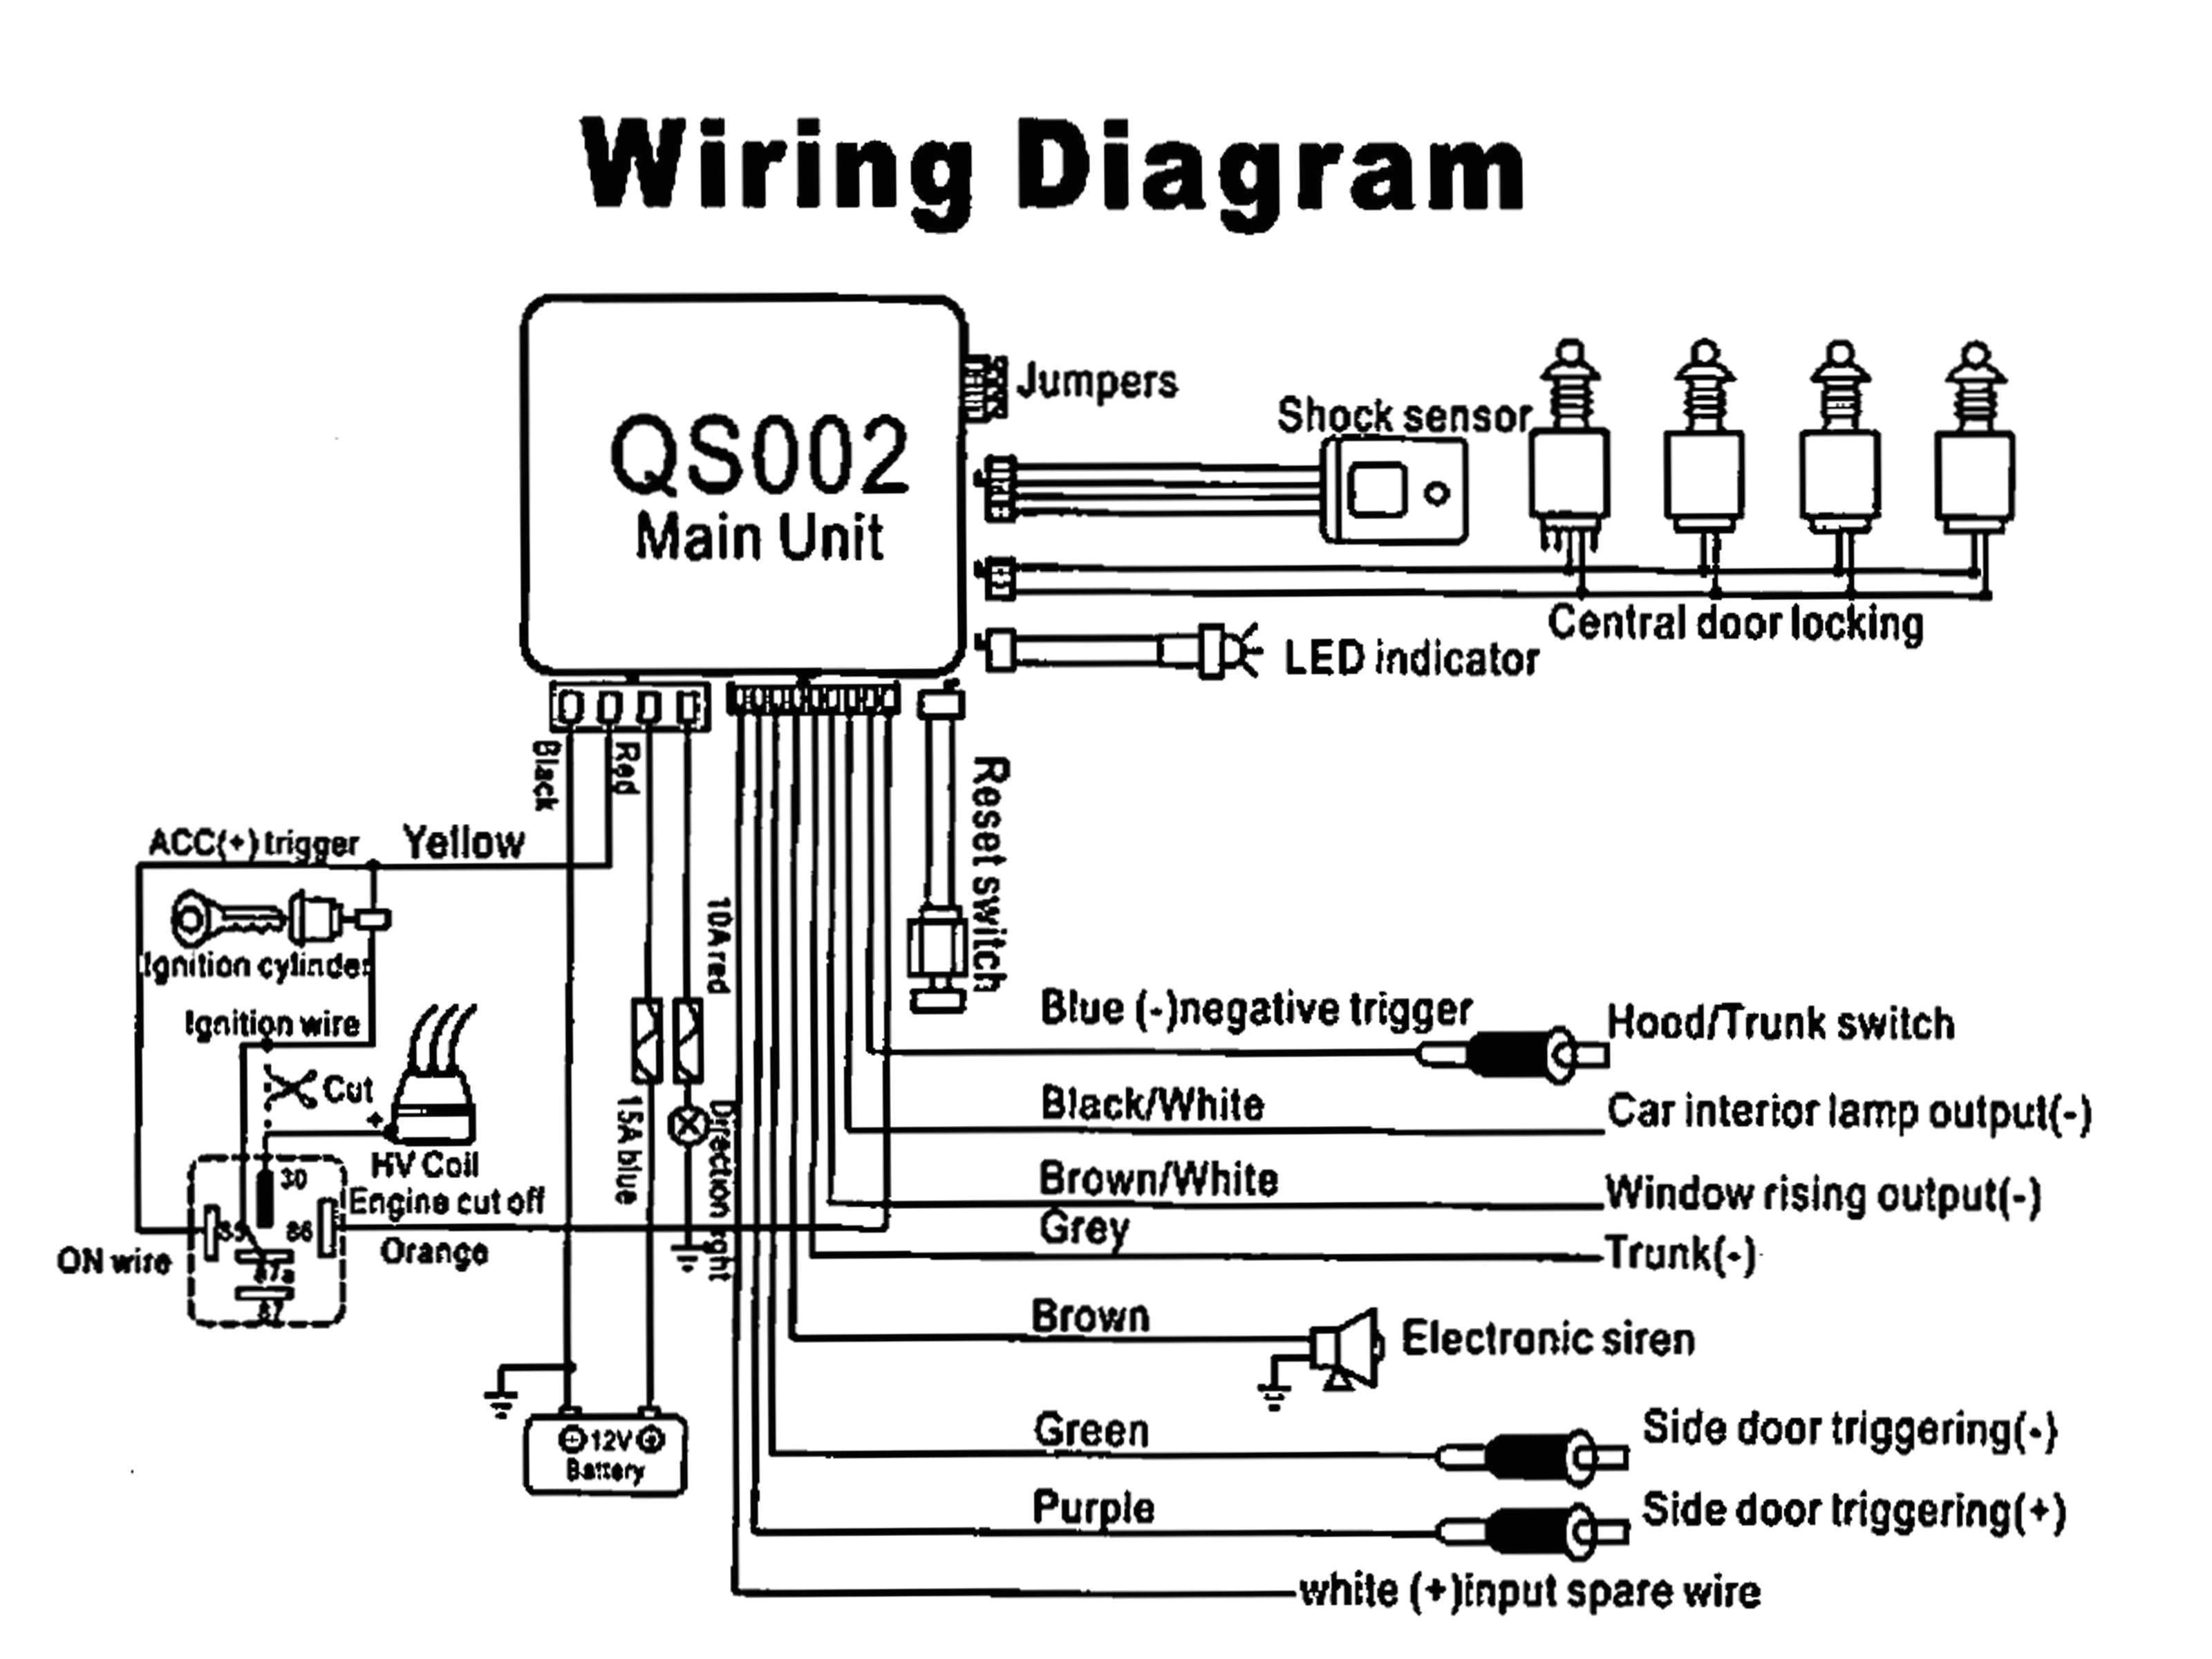 falcon alarm wiring diagram blog wiring diagram falcon alarm wiring diagram